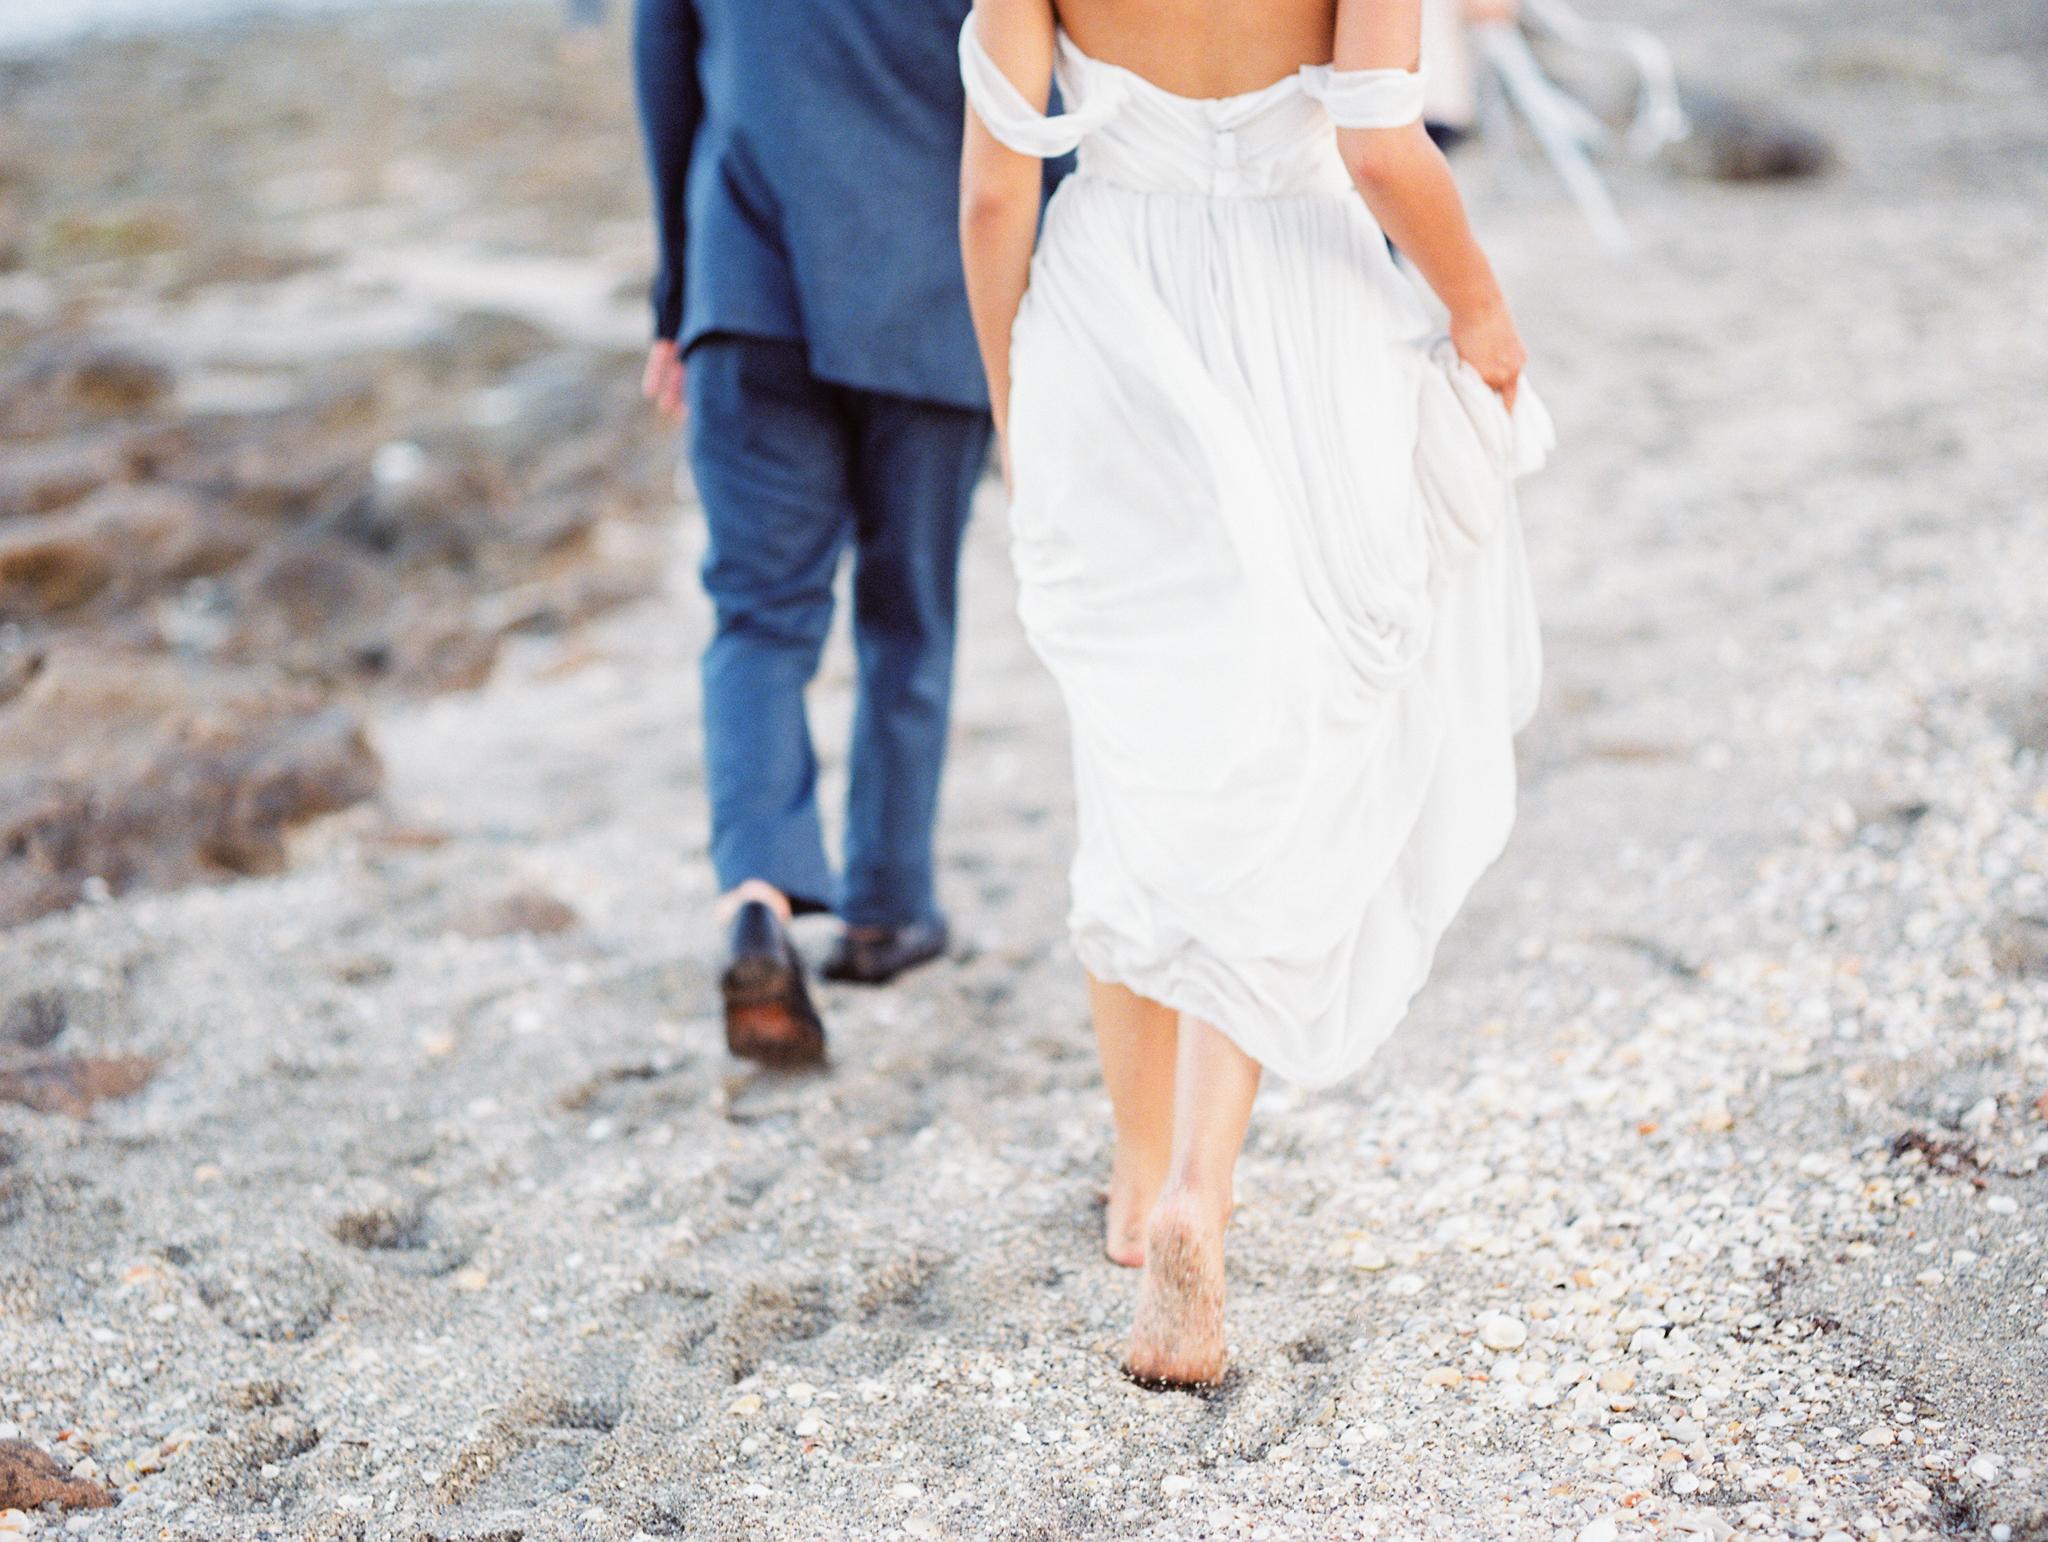 coral cove, jupiter beach FL, palm beach wedding photos, bride and groom on beach